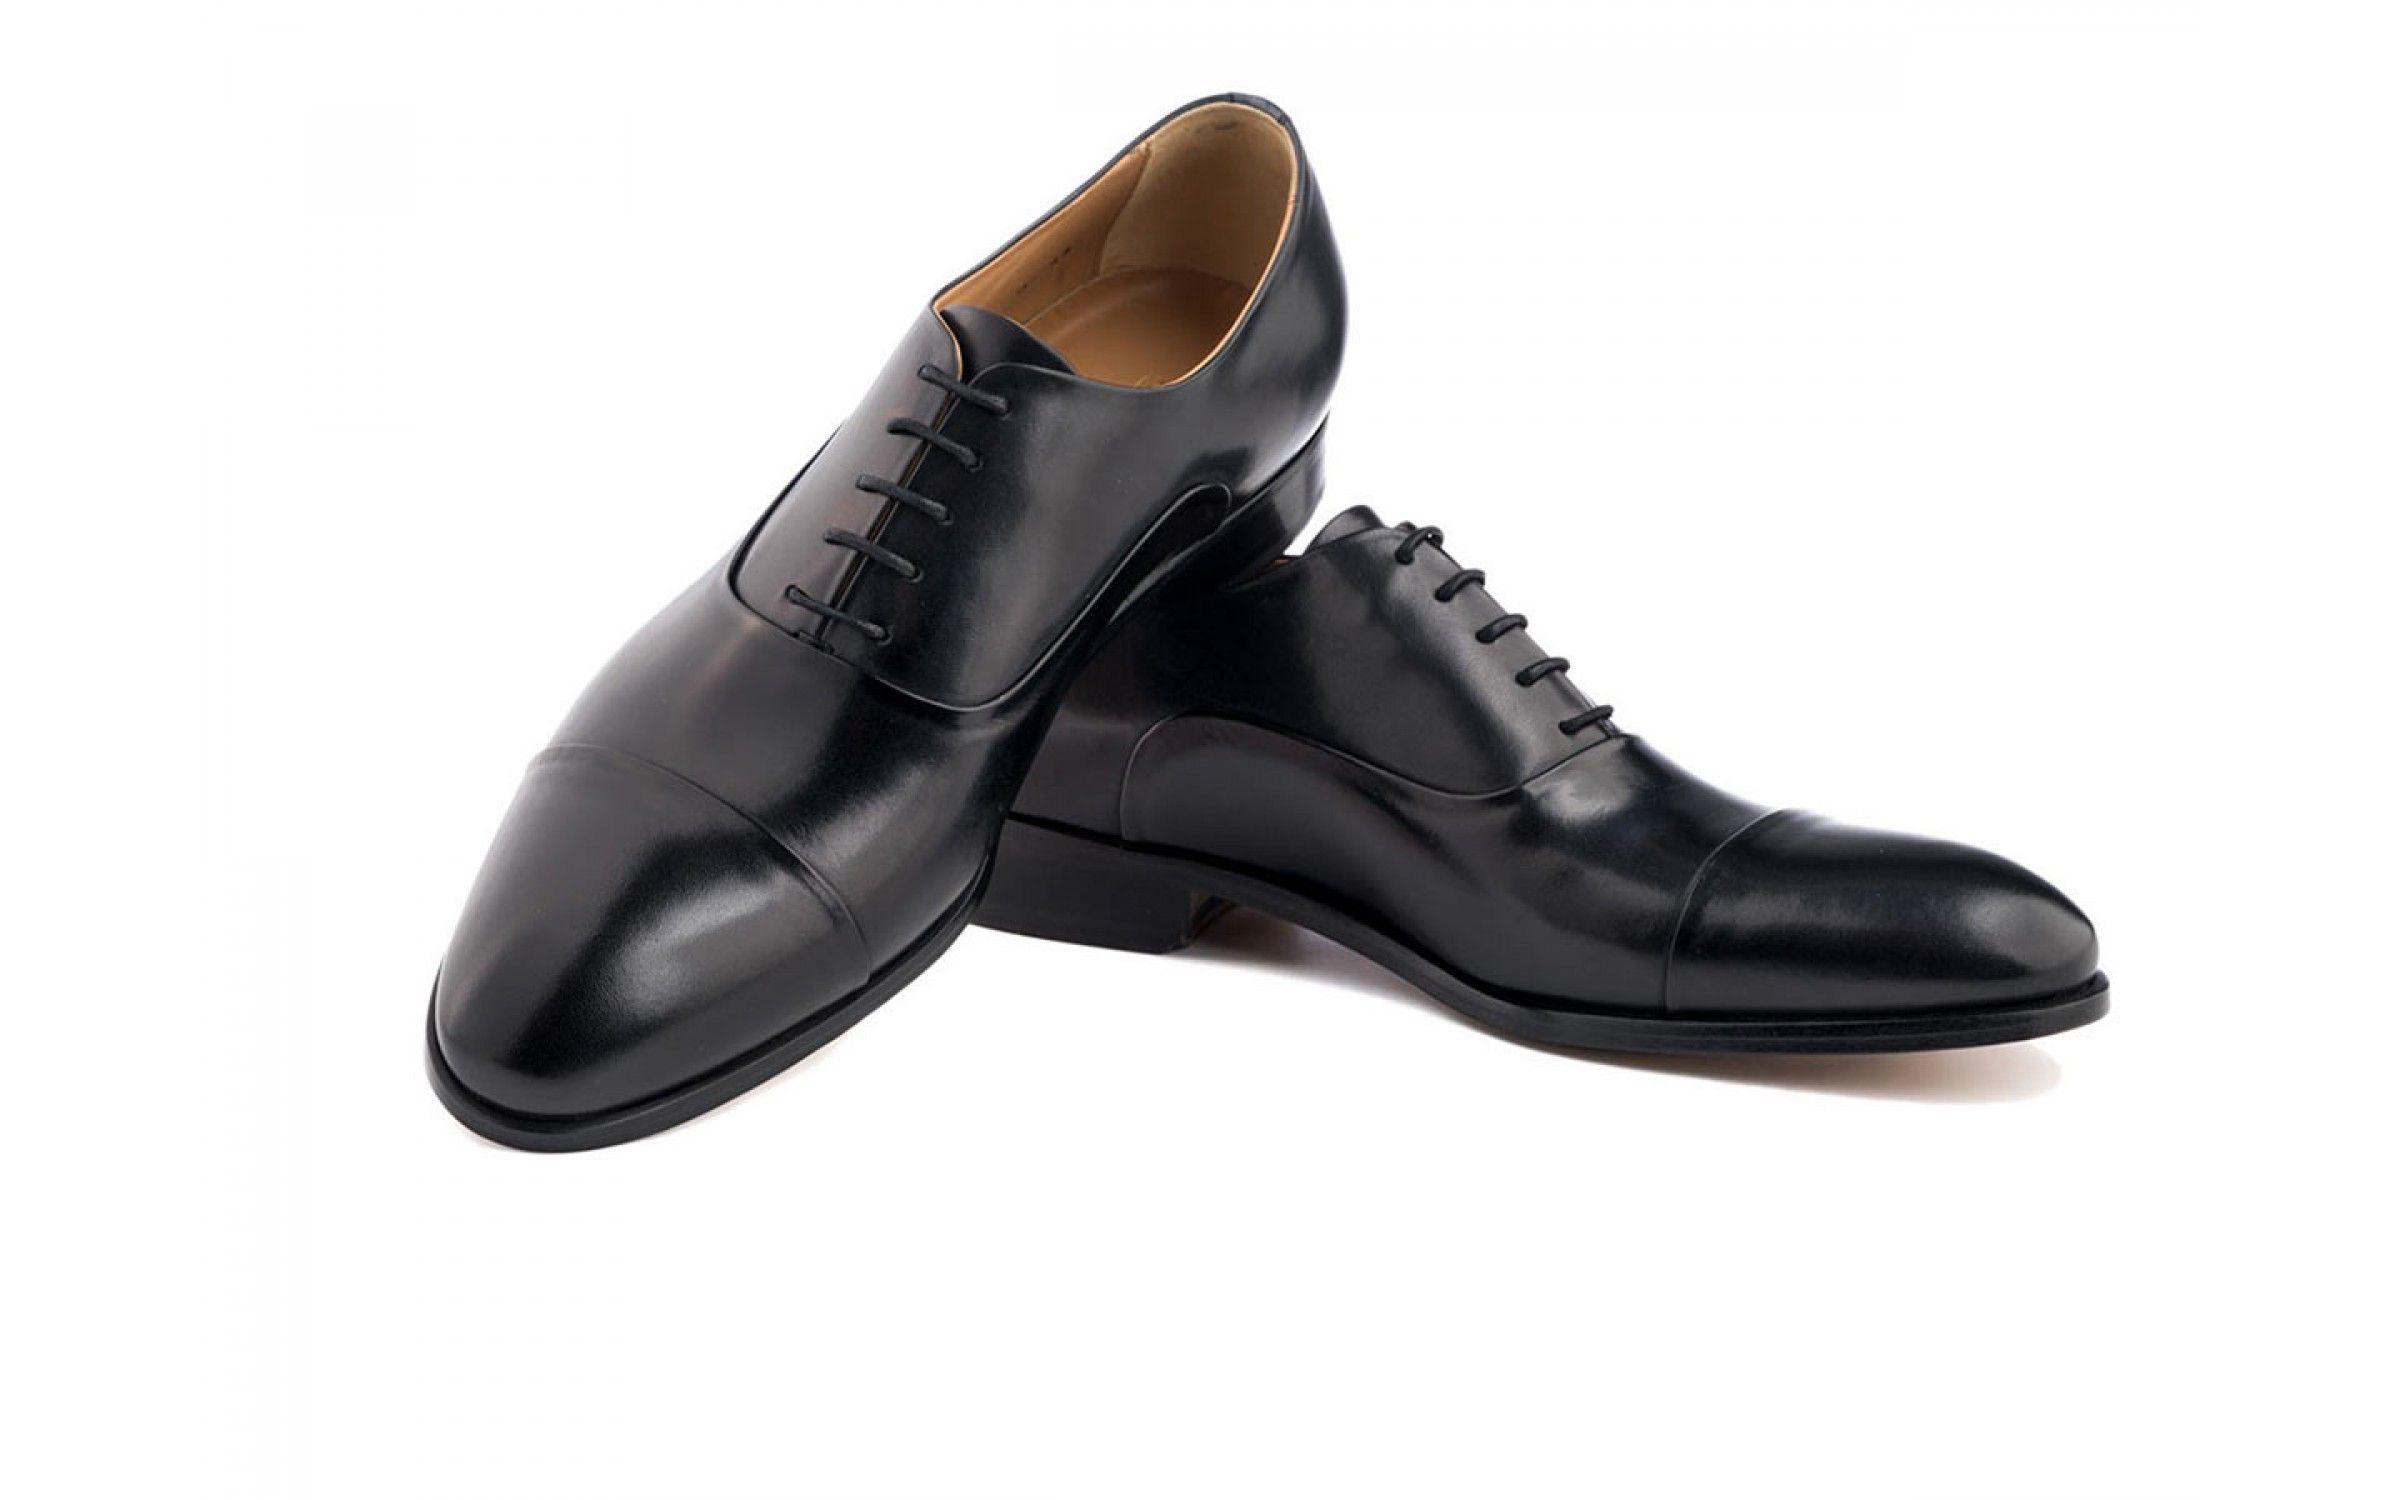 2d49c5b566974 Oxford Cap Toe Dress Shoe in Black Antique Italian Leather Oxford Shoes